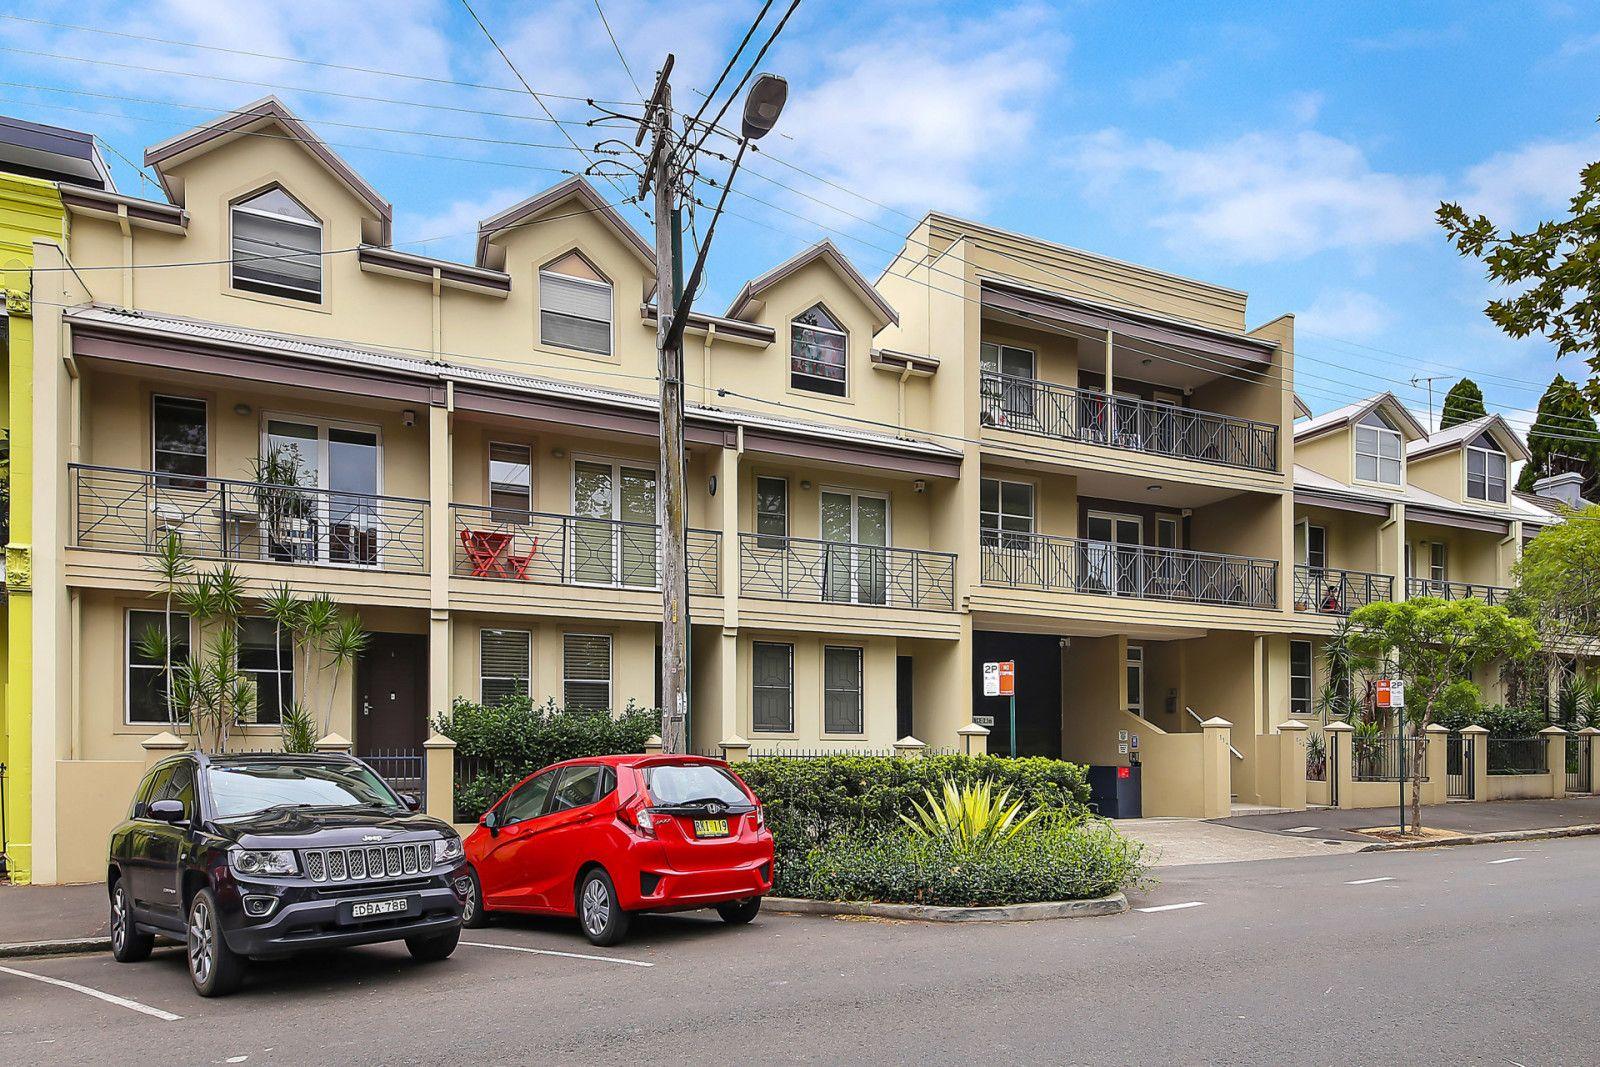 4/114-124 Pitt Street, Redfern NSW 2016, Image 0